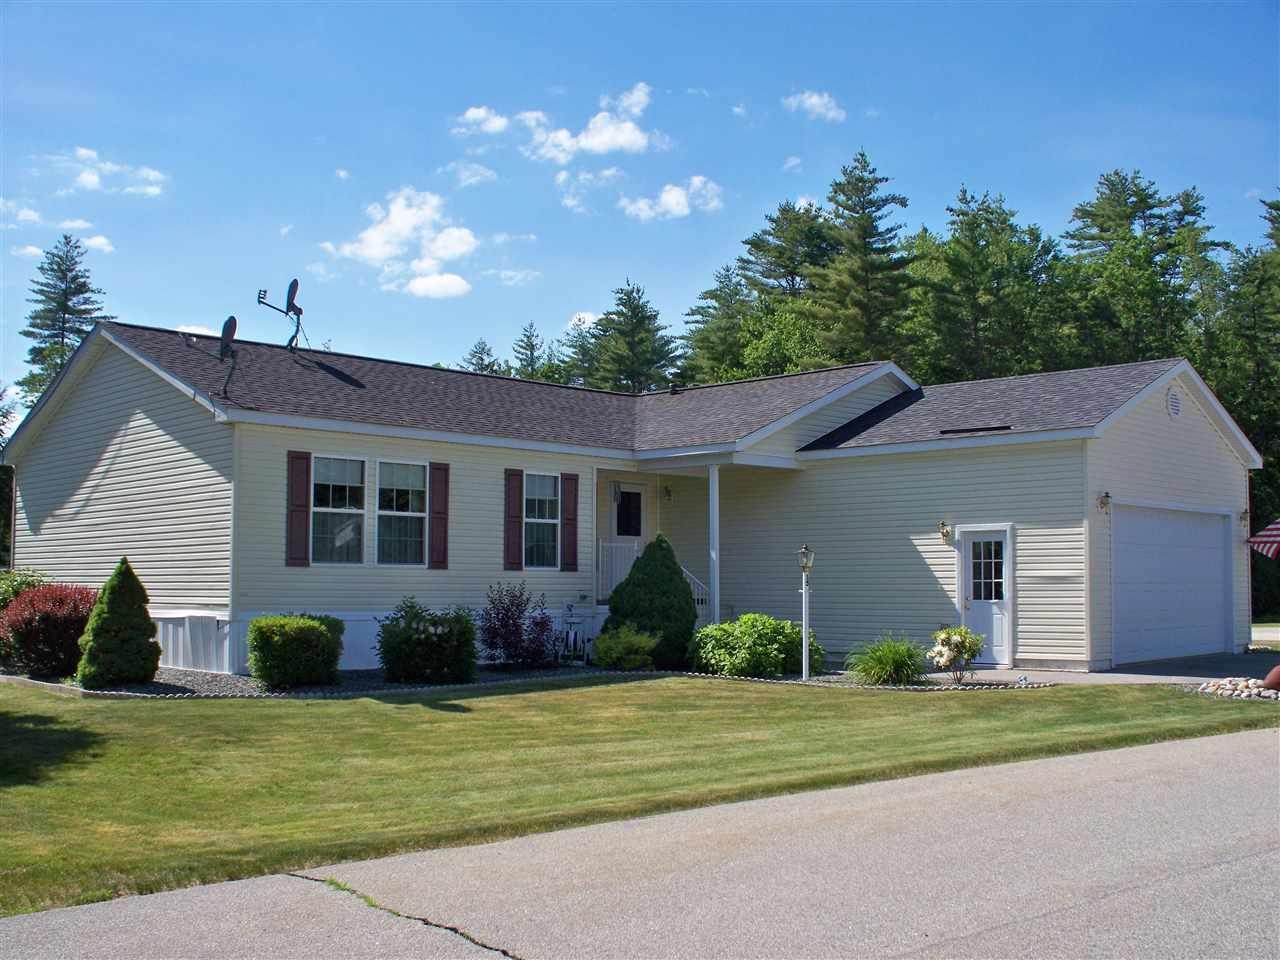 15 NORTHBROOK DR, TILTON, NH — MLS# 4641606 — Better Homes ... Tilton Nh Homes For Sale Photos